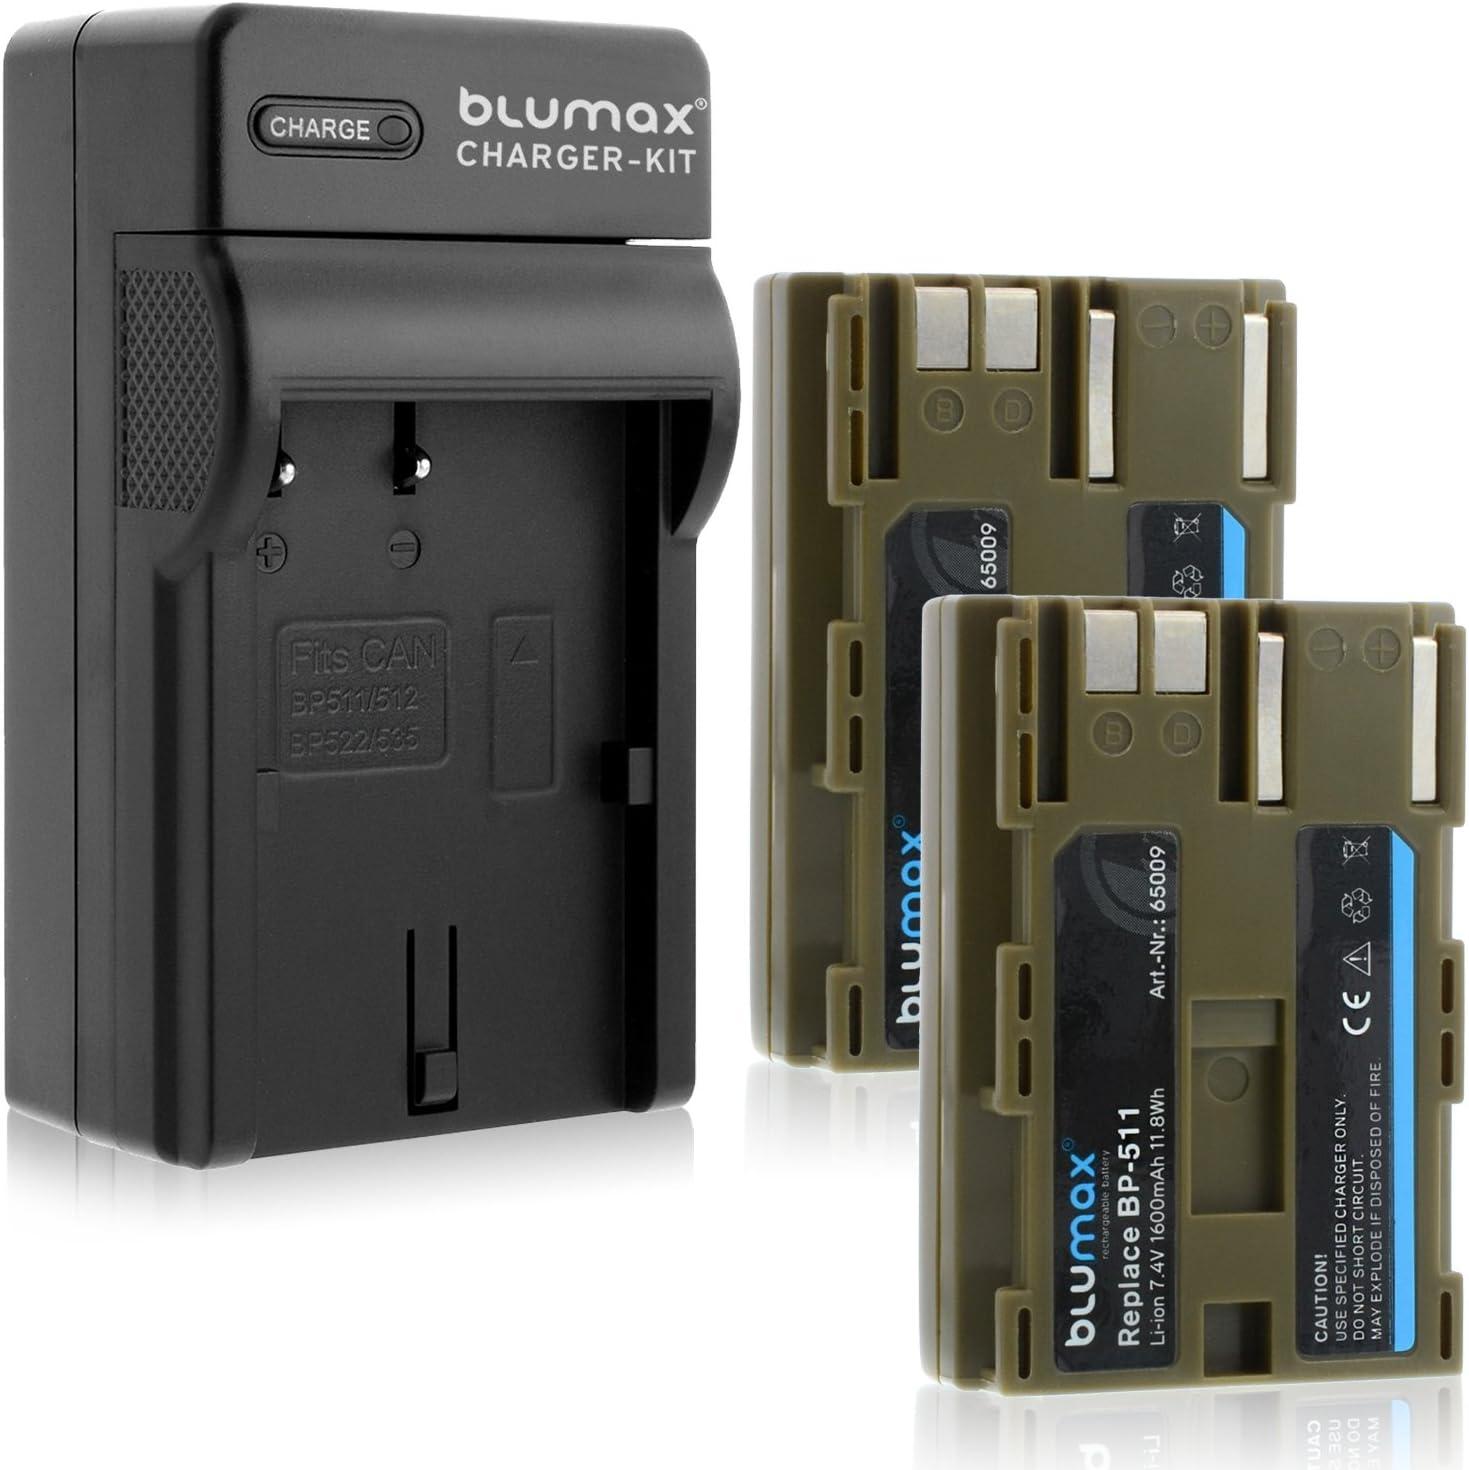 BP-511A 2040mAh Ladeger/ät BP-511 Blumax Gold Edition BP-511 passend zu Canon EOS 5D// 10D// 20D// 300D// 30D// 40D// 50D UVM BP-511A